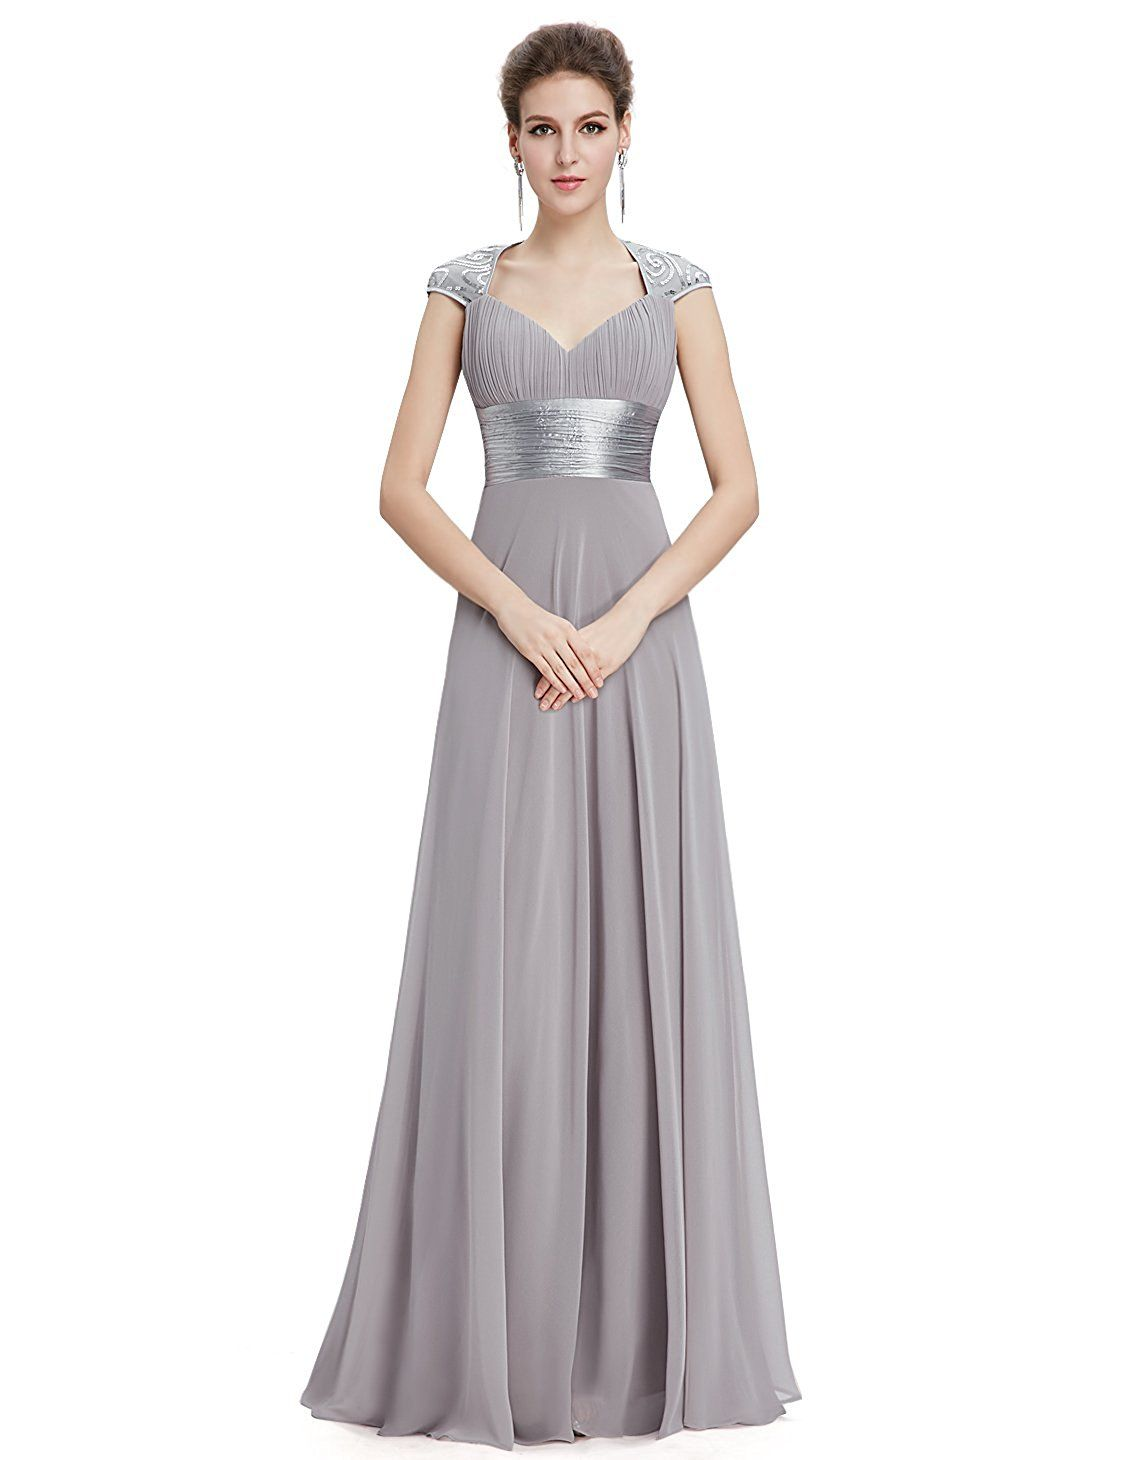 9cb3a0291bc3 Ever Pretty Chiffon Sexy V-neck Ruched Empire Line Evening Dress 09672